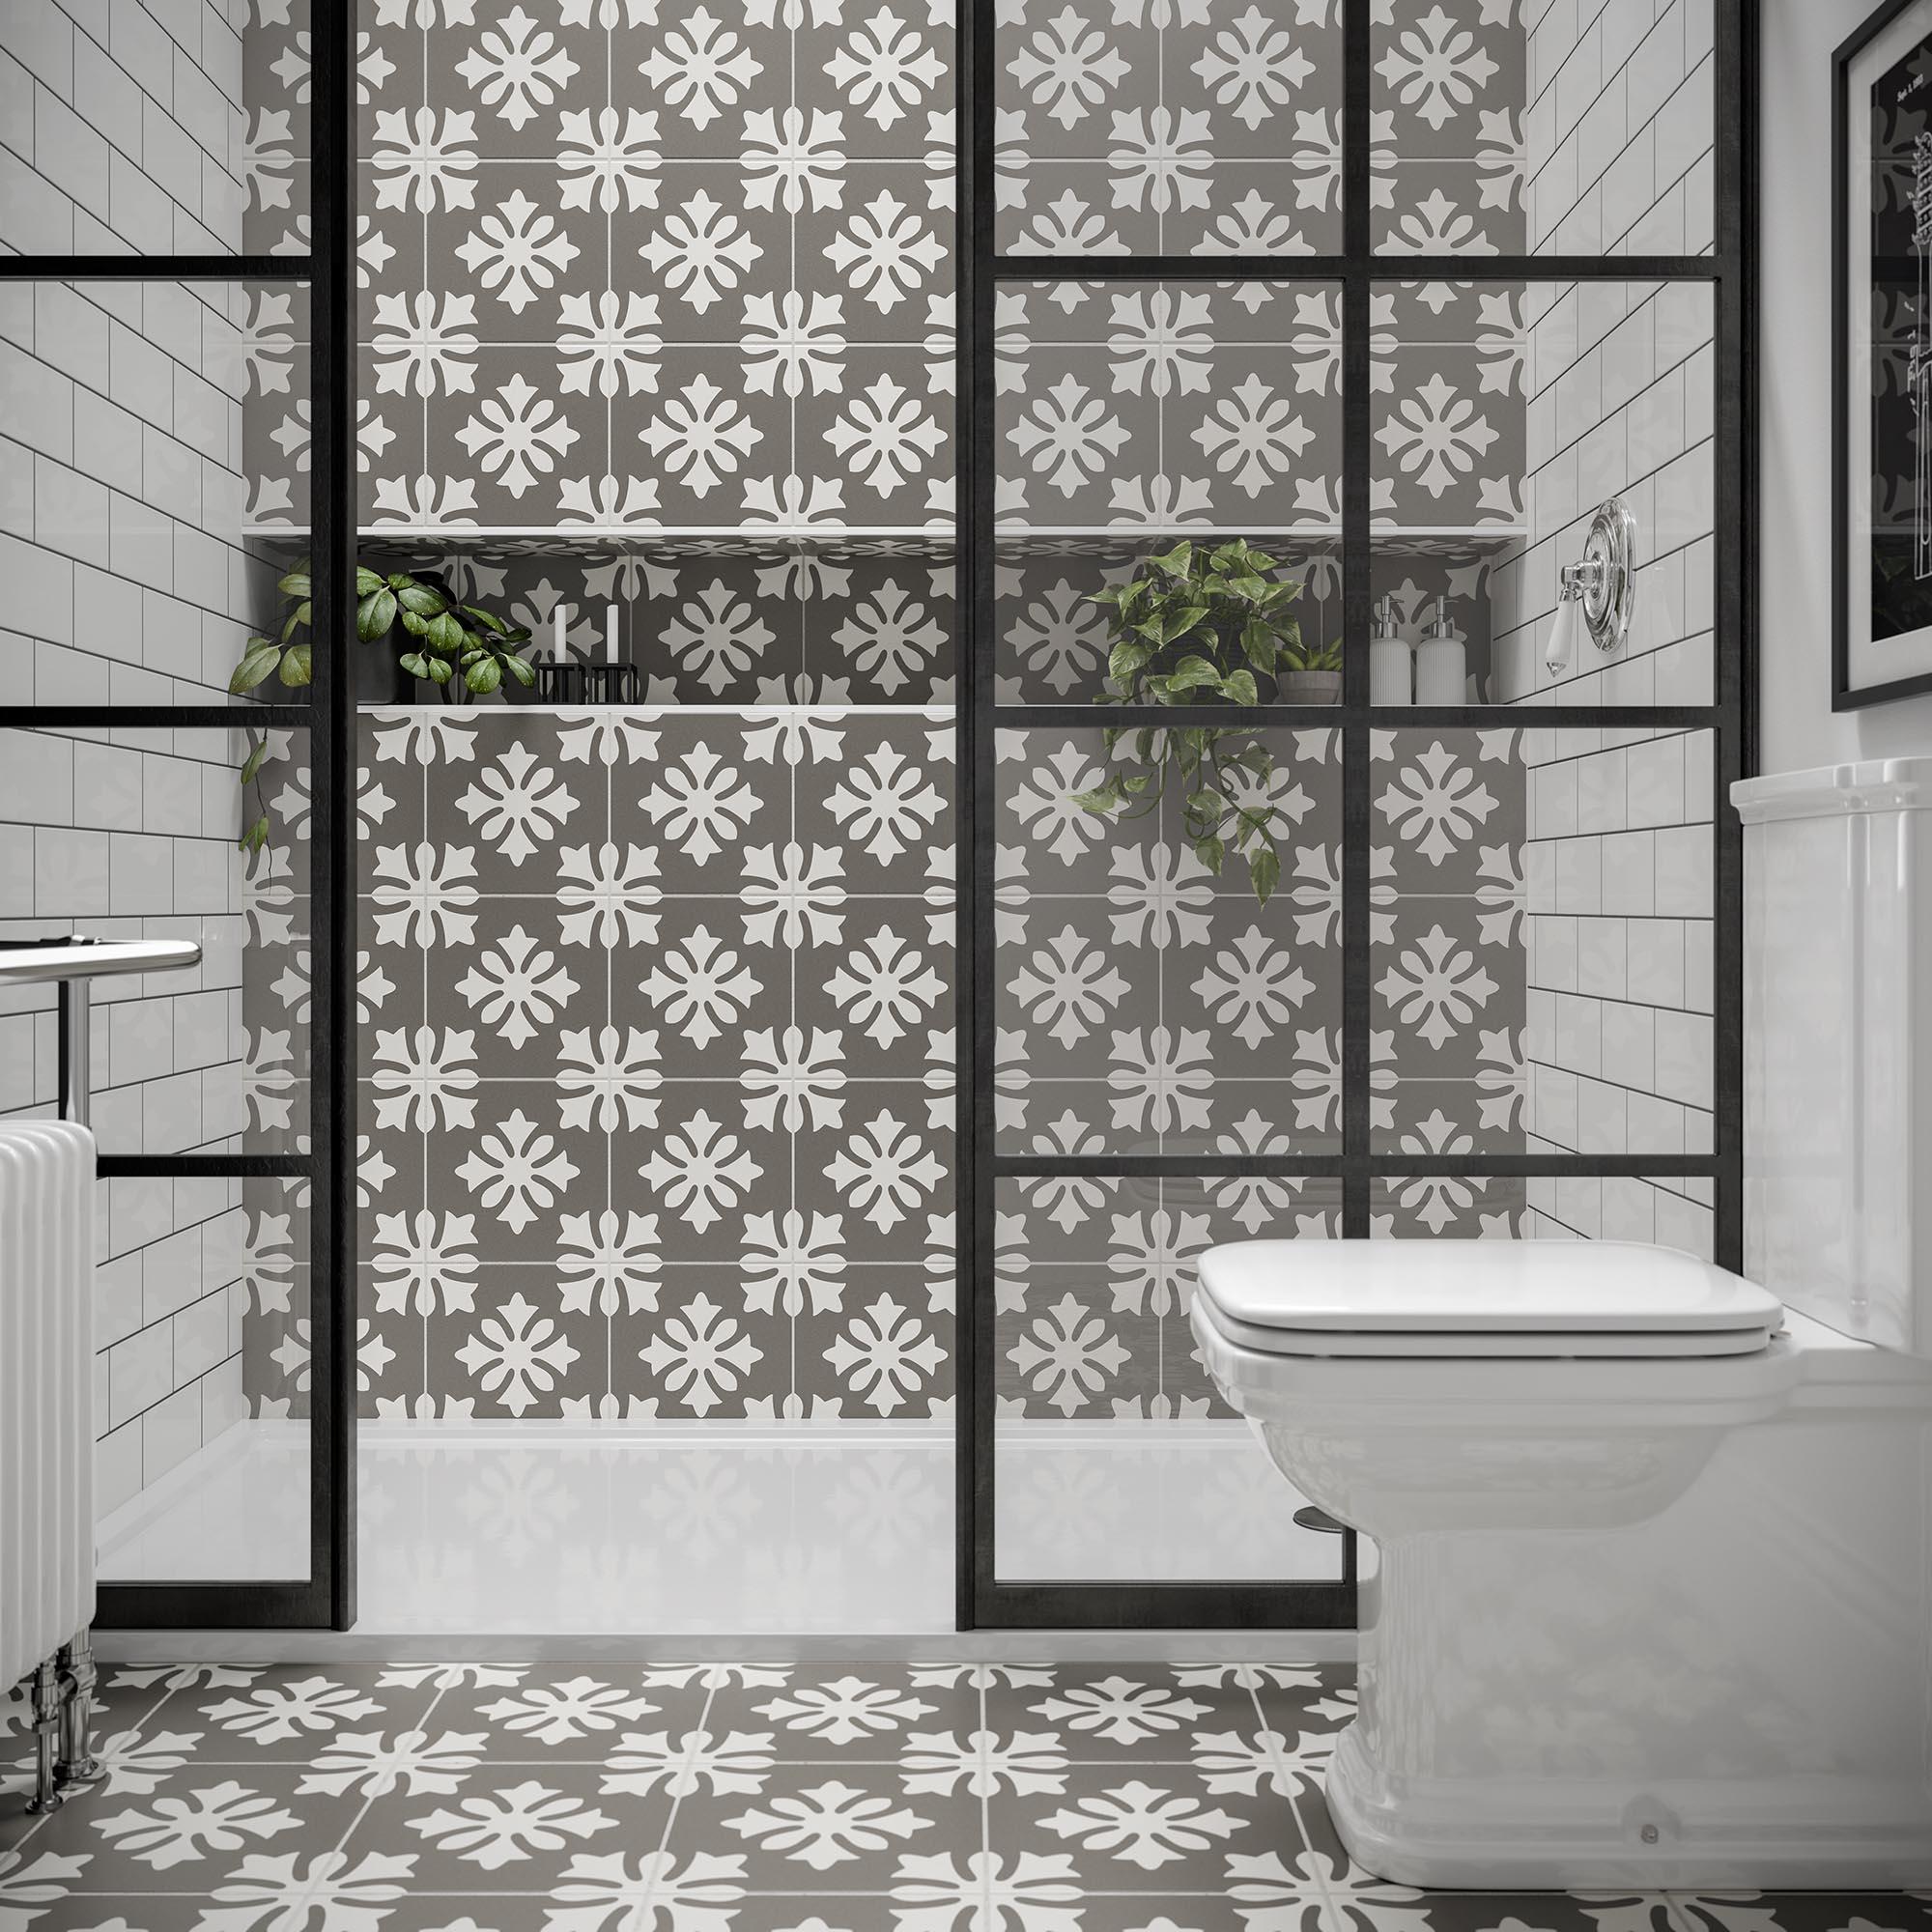 Patterned Tiles 1